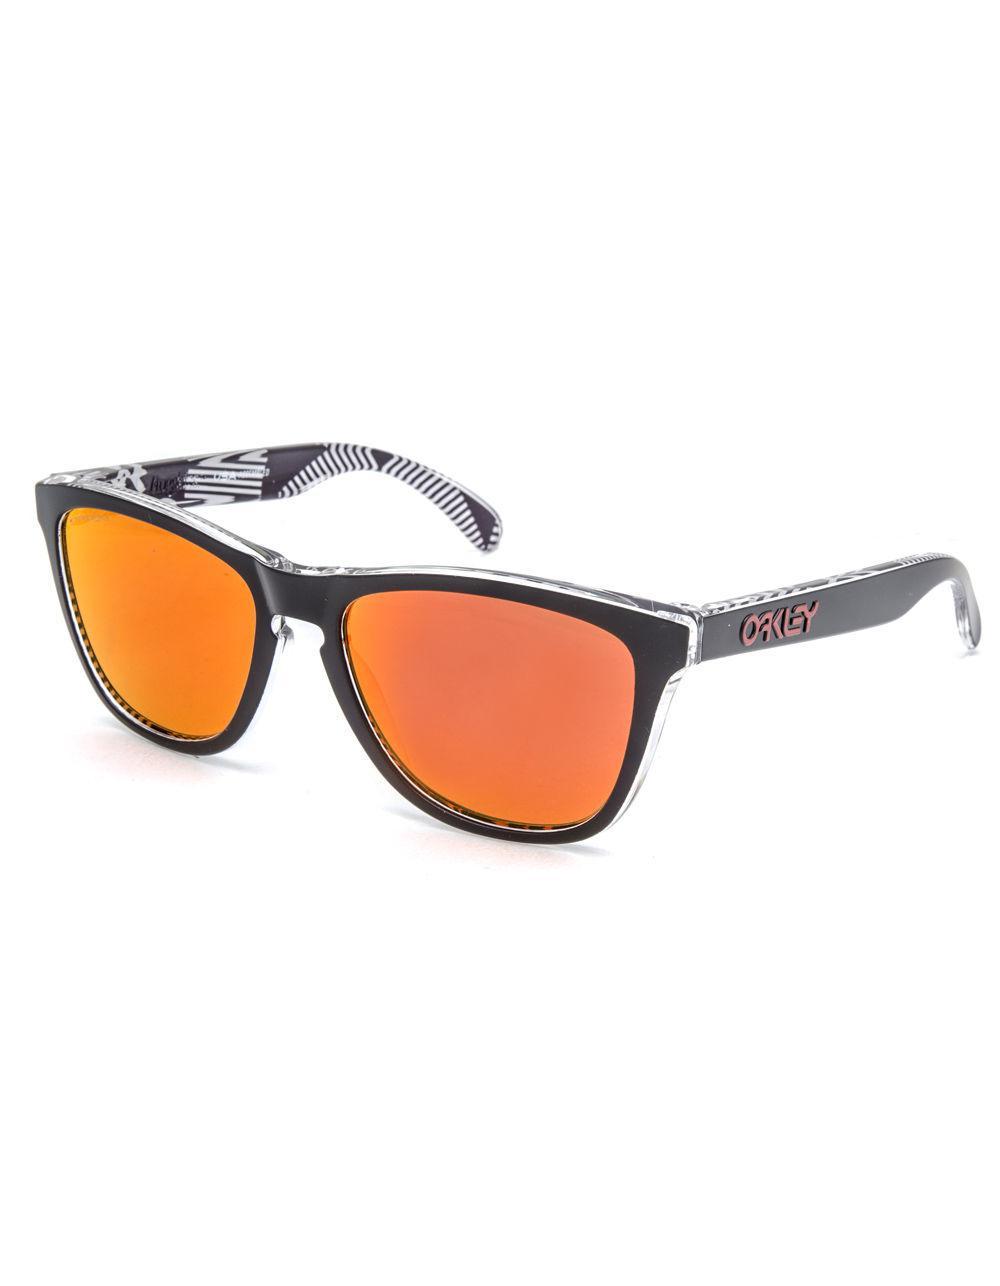 6b655ec591 Oakley. Men s Frogskins Urban Commuter Tokyo Black   Prizm Ruby Sunglasses